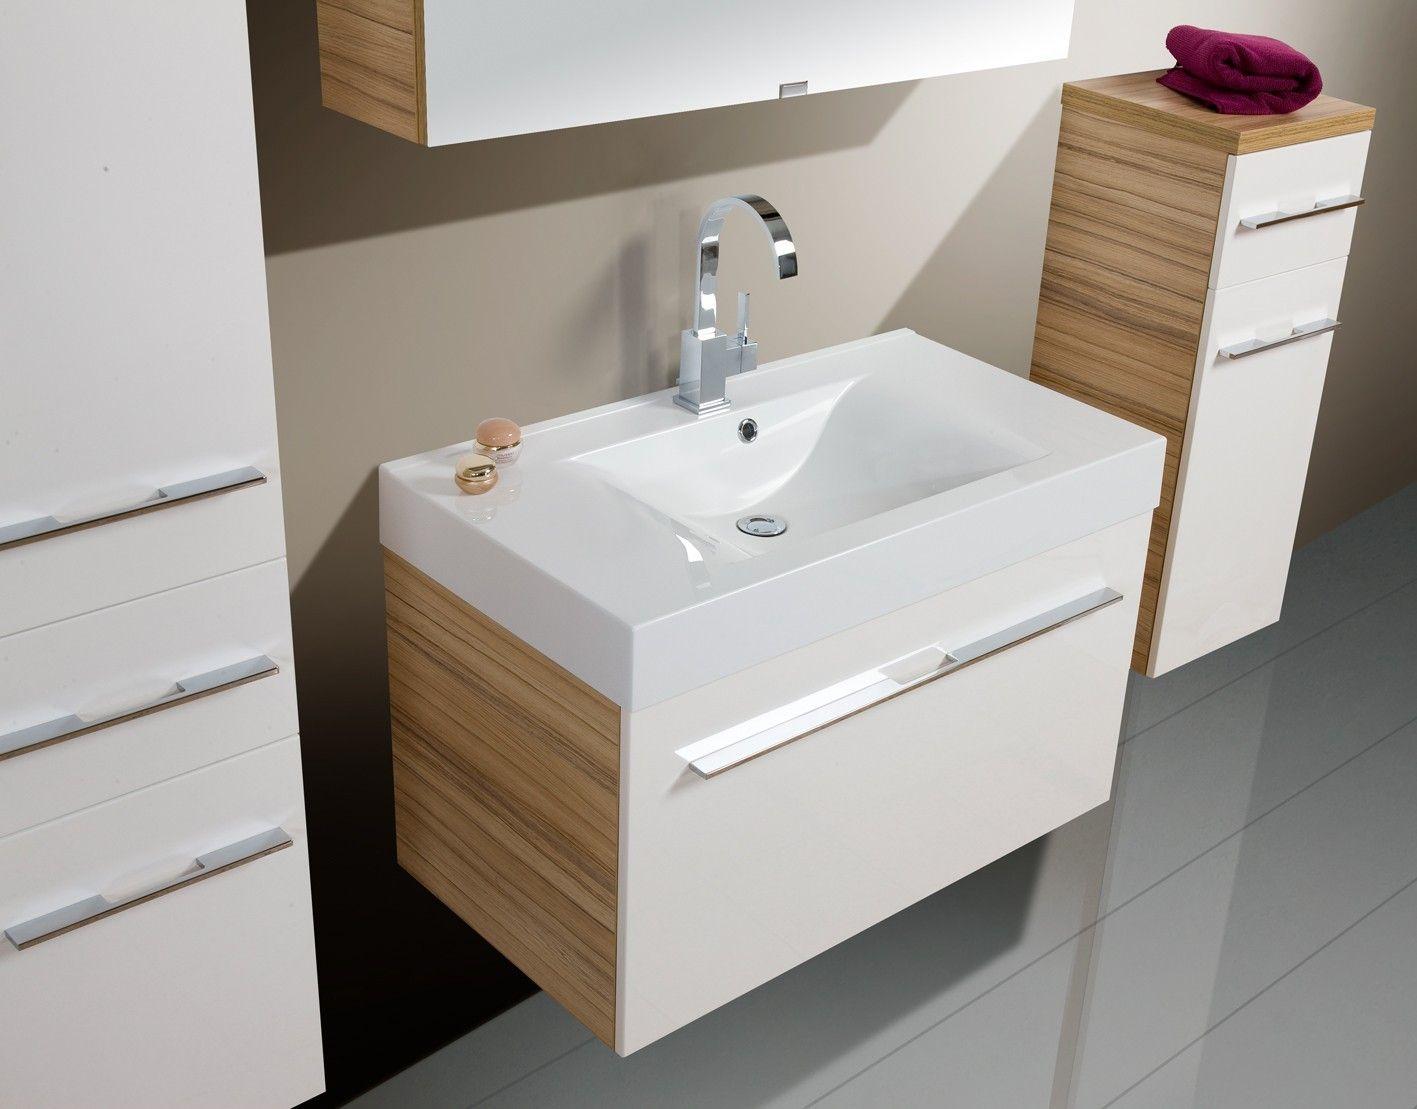 Melamine Bathroom Vanity Cabinet Floor Standing Bathroom Cabinet Wall Hung Bathroom Vanit Wall Hung Bathroom Vanities Storage Cabinets Bathroom Storage Cabinet